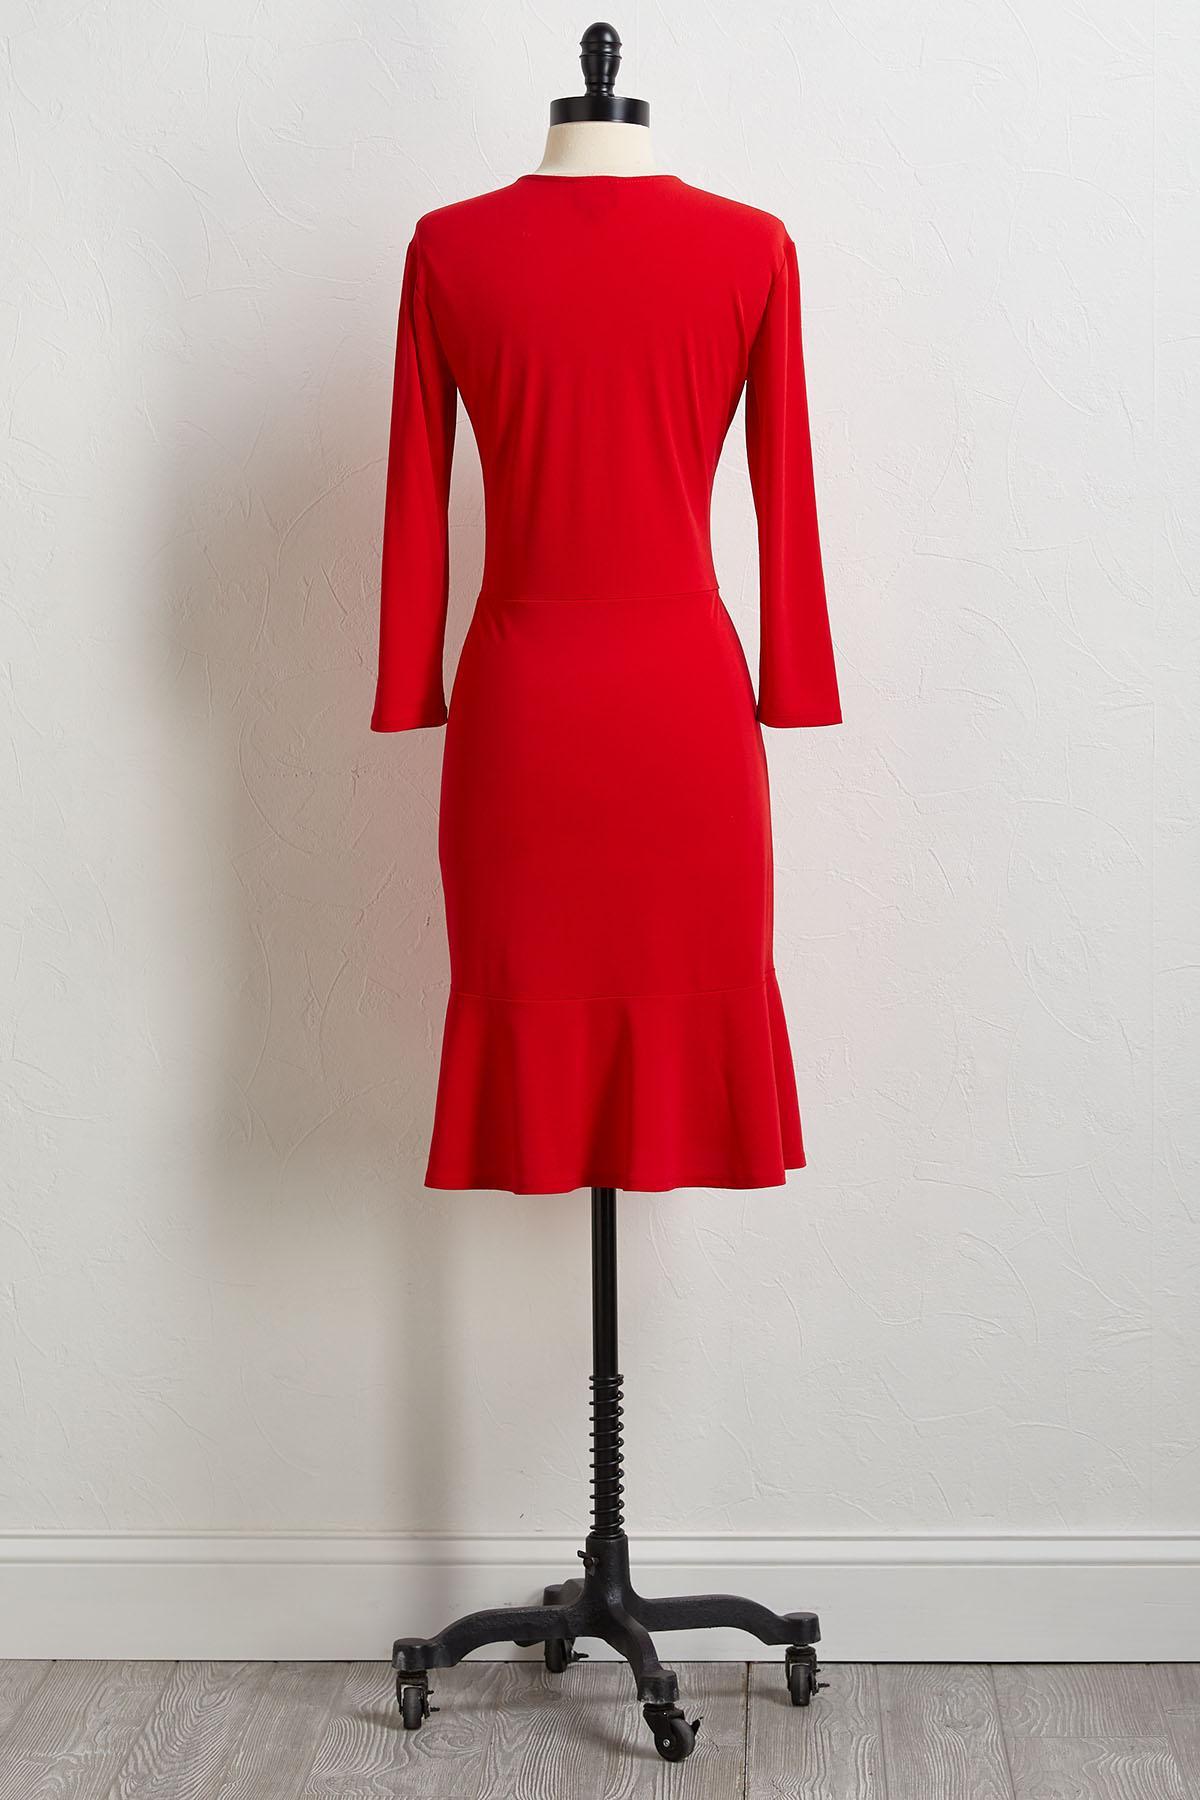 Red Ruffled Dress